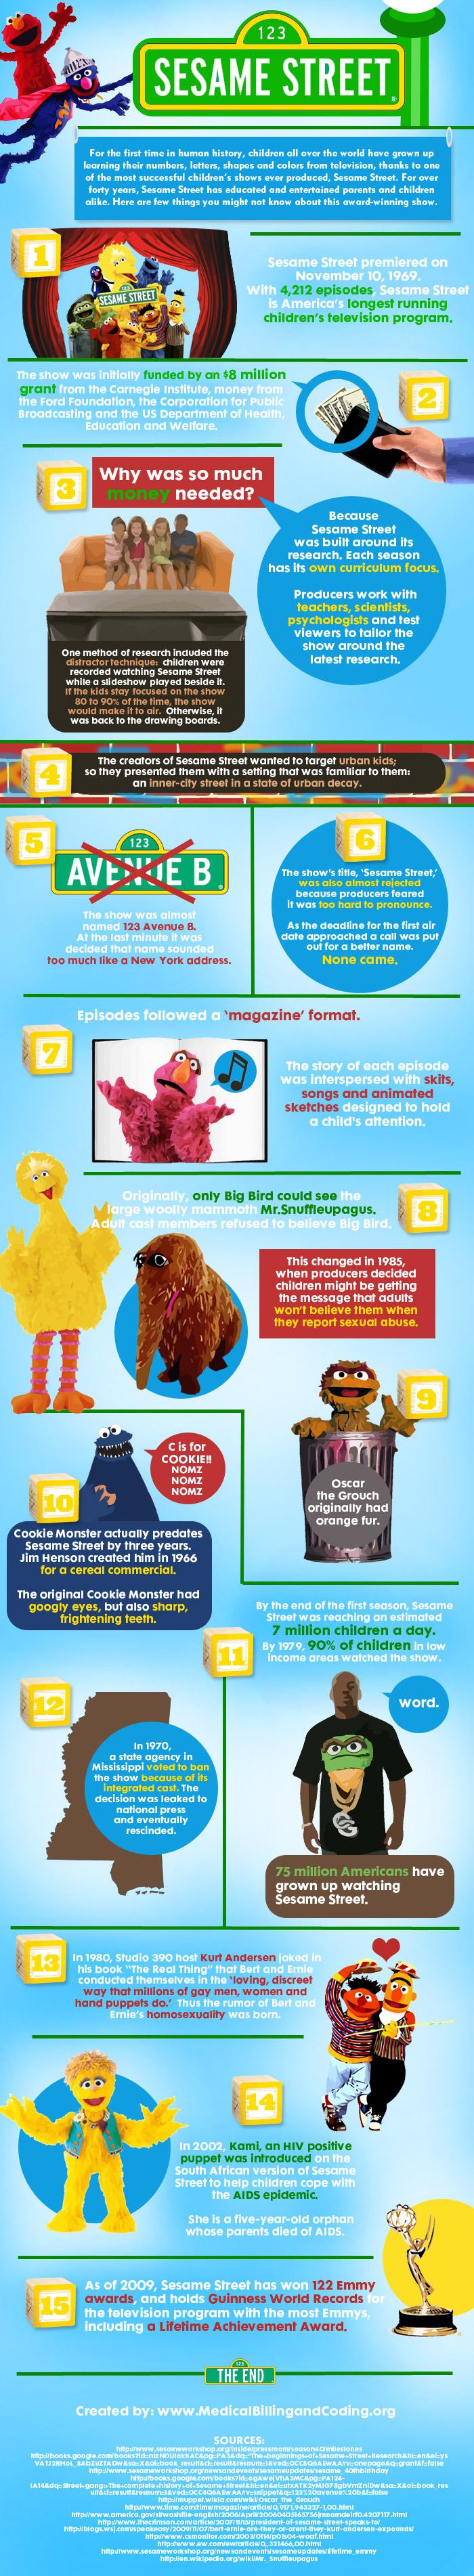 Sesame Street Facts